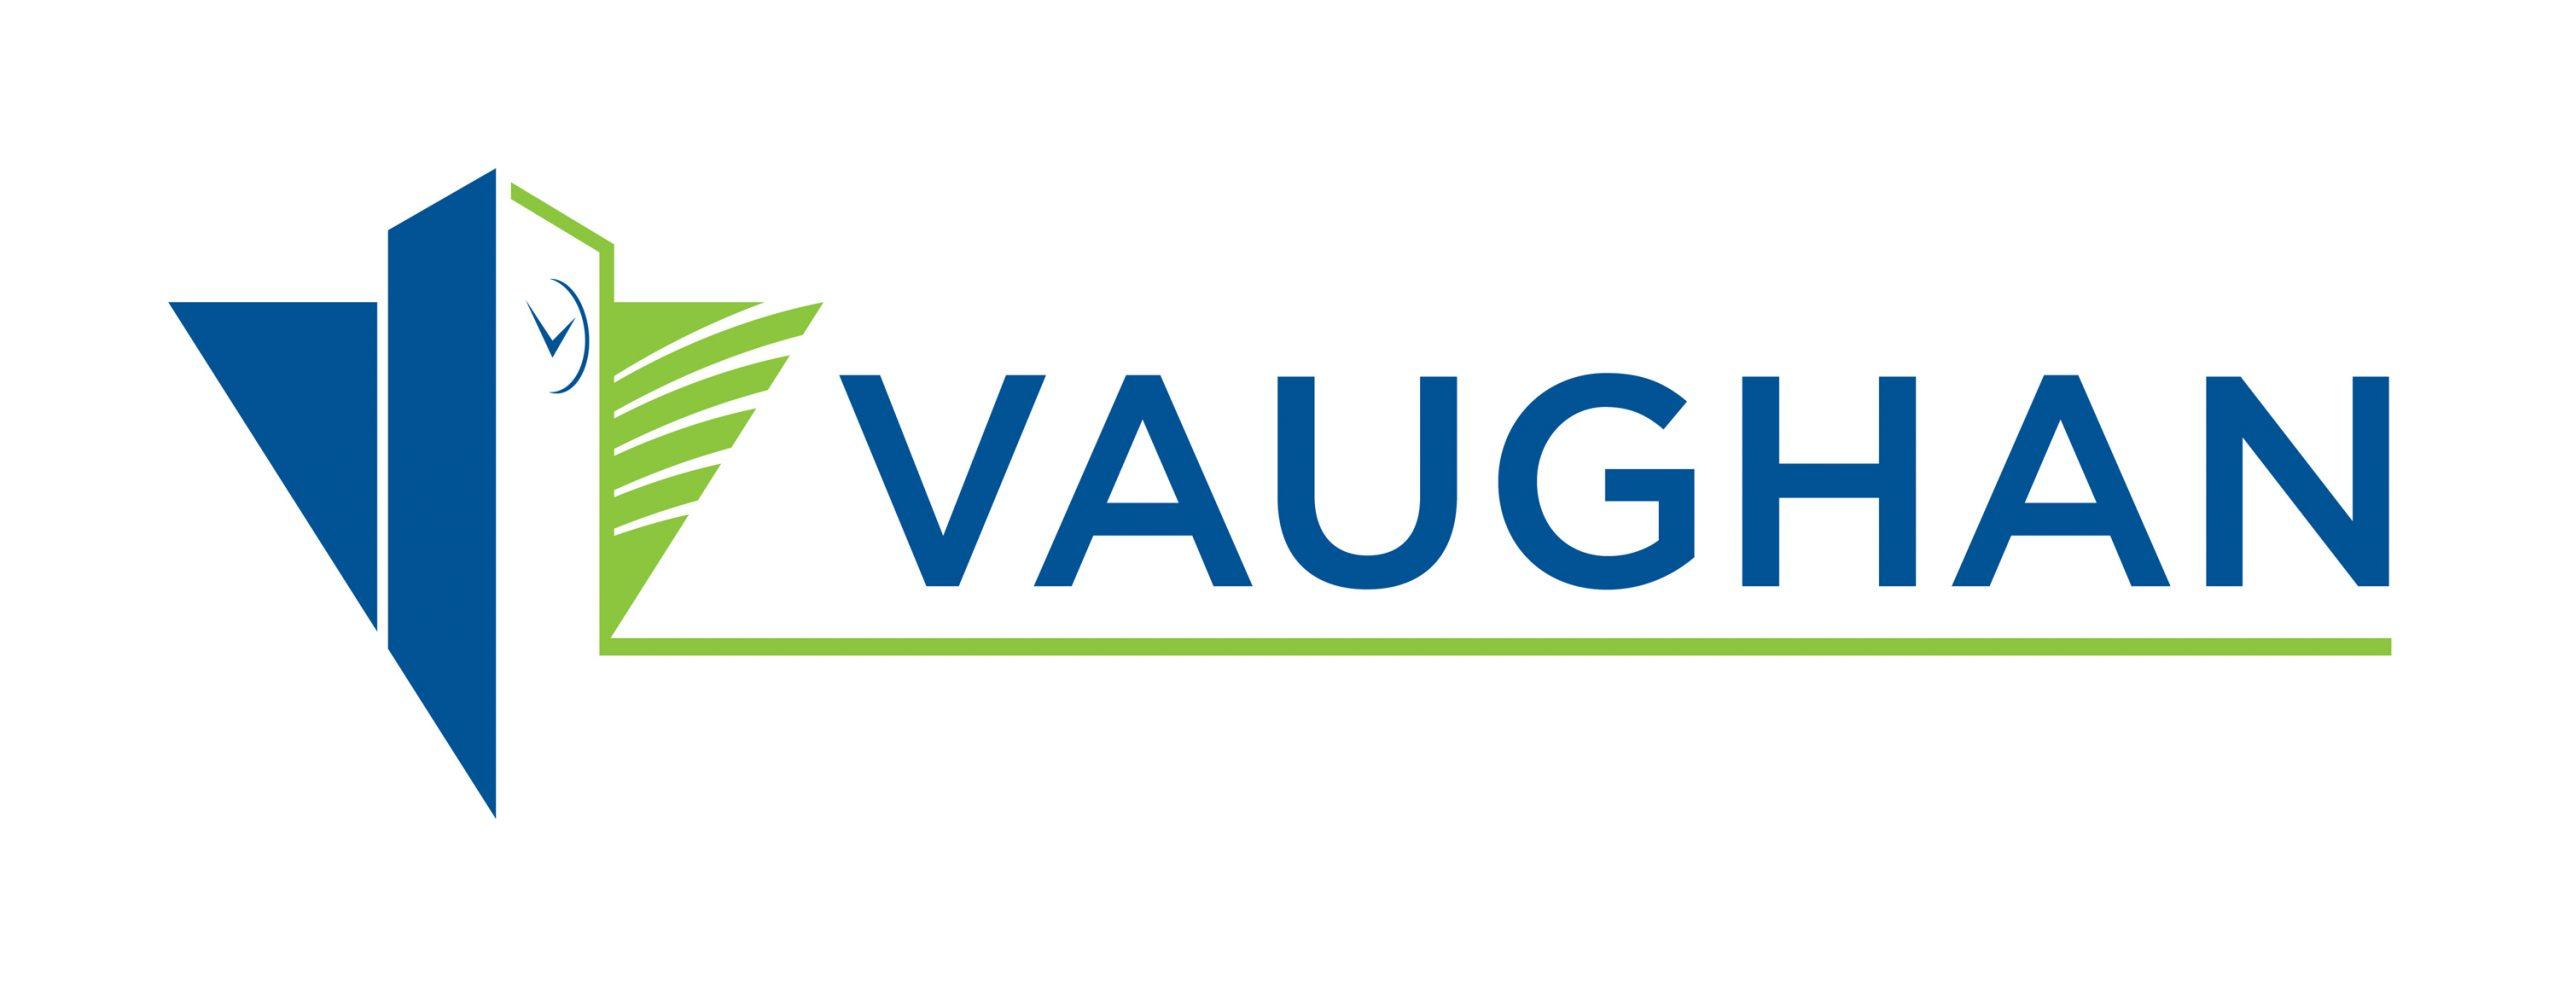 City of Vaughan